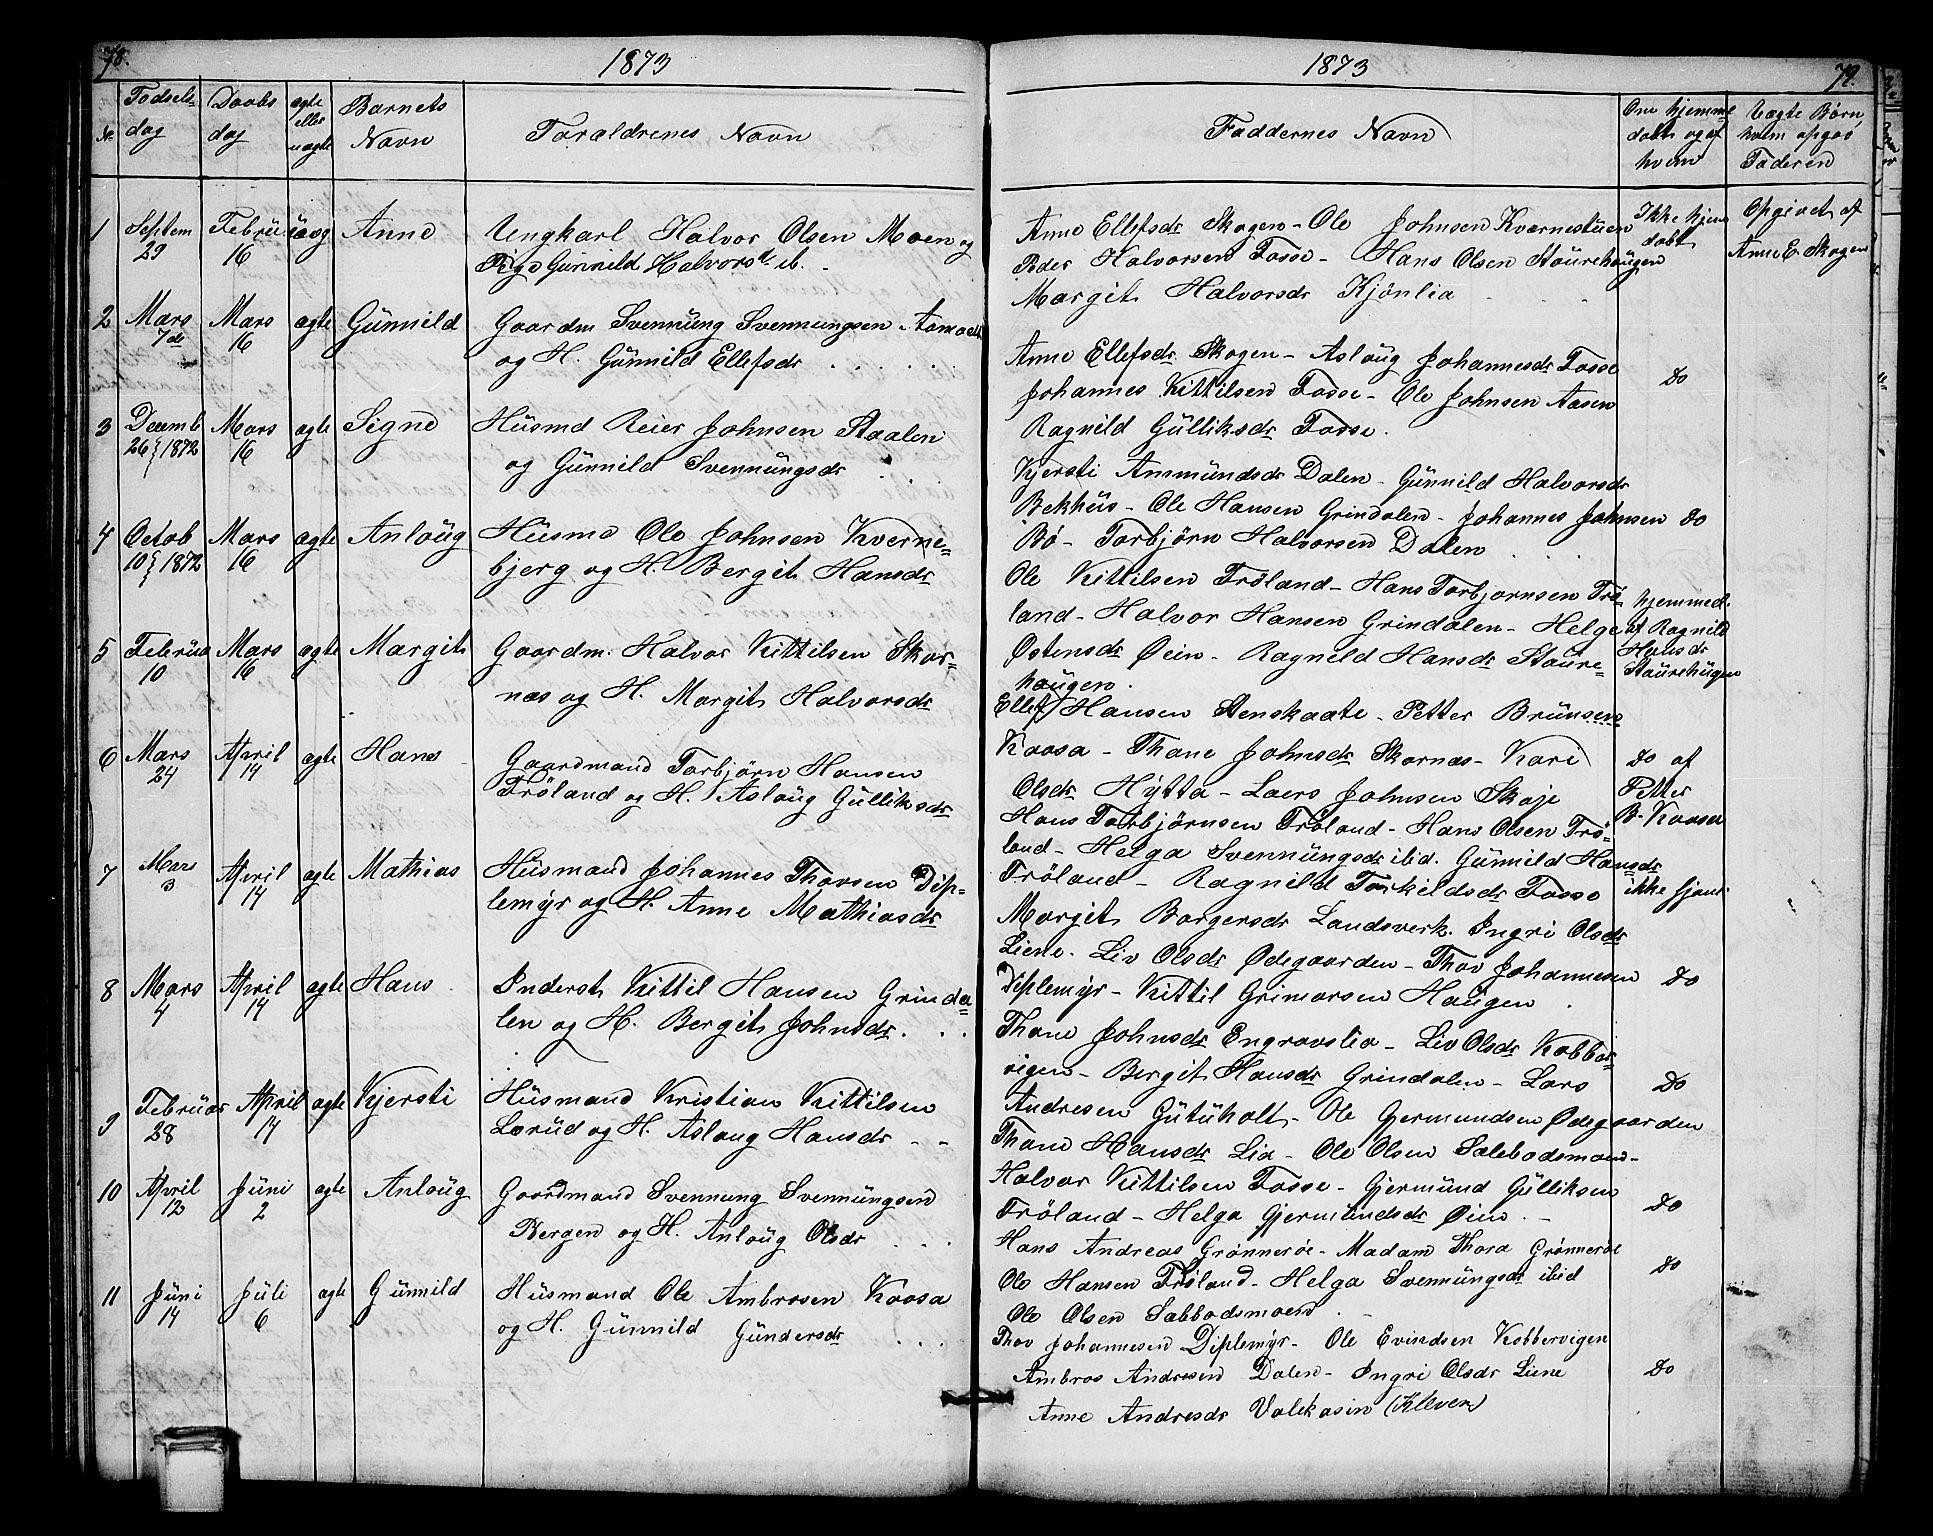 SAKO, Hjartdal kirkebøker, G/Gb/L0002: Klokkerbok nr. II 2, 1854-1884, s. 78-79